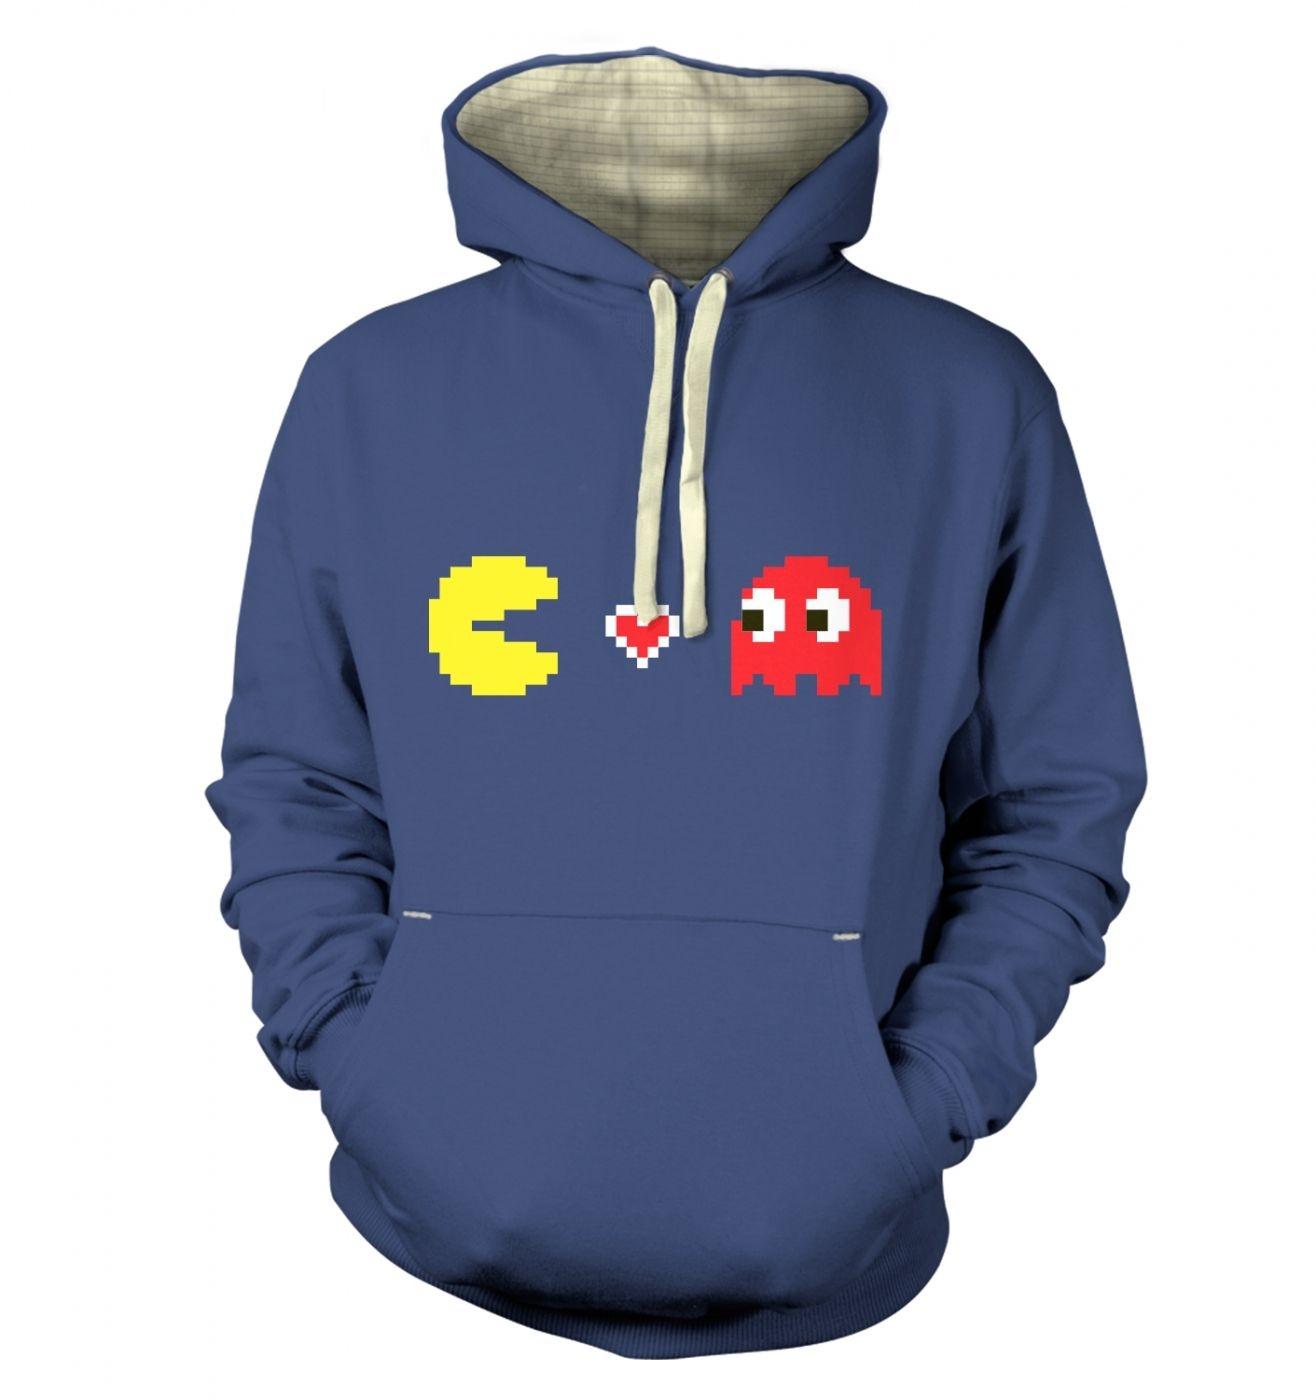 Squid Love Cheese premium hoodie